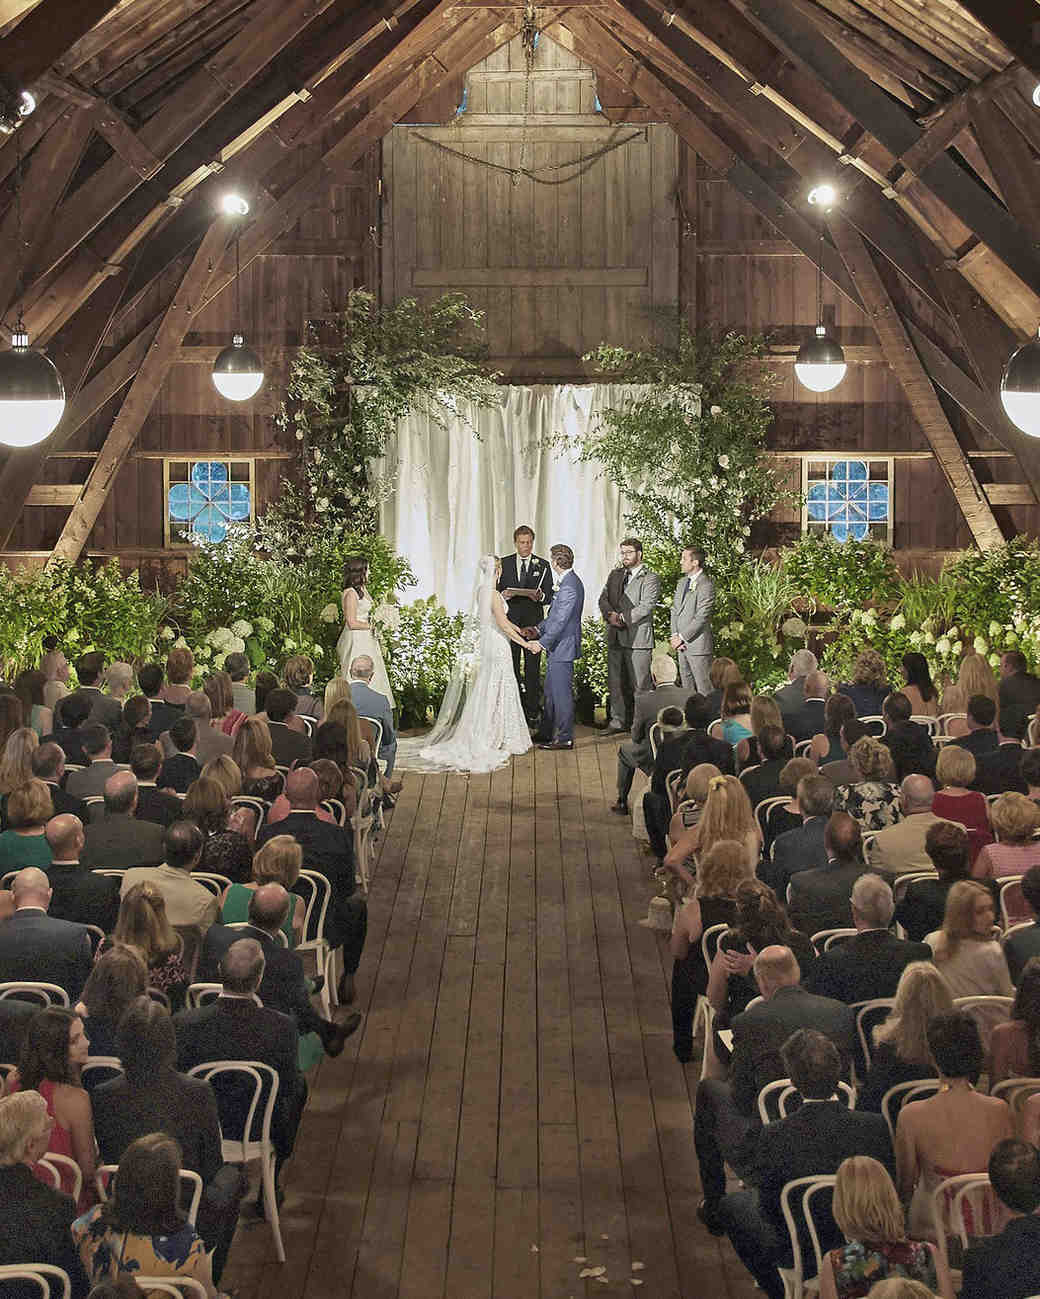 joyann jeremy wedding ceremony